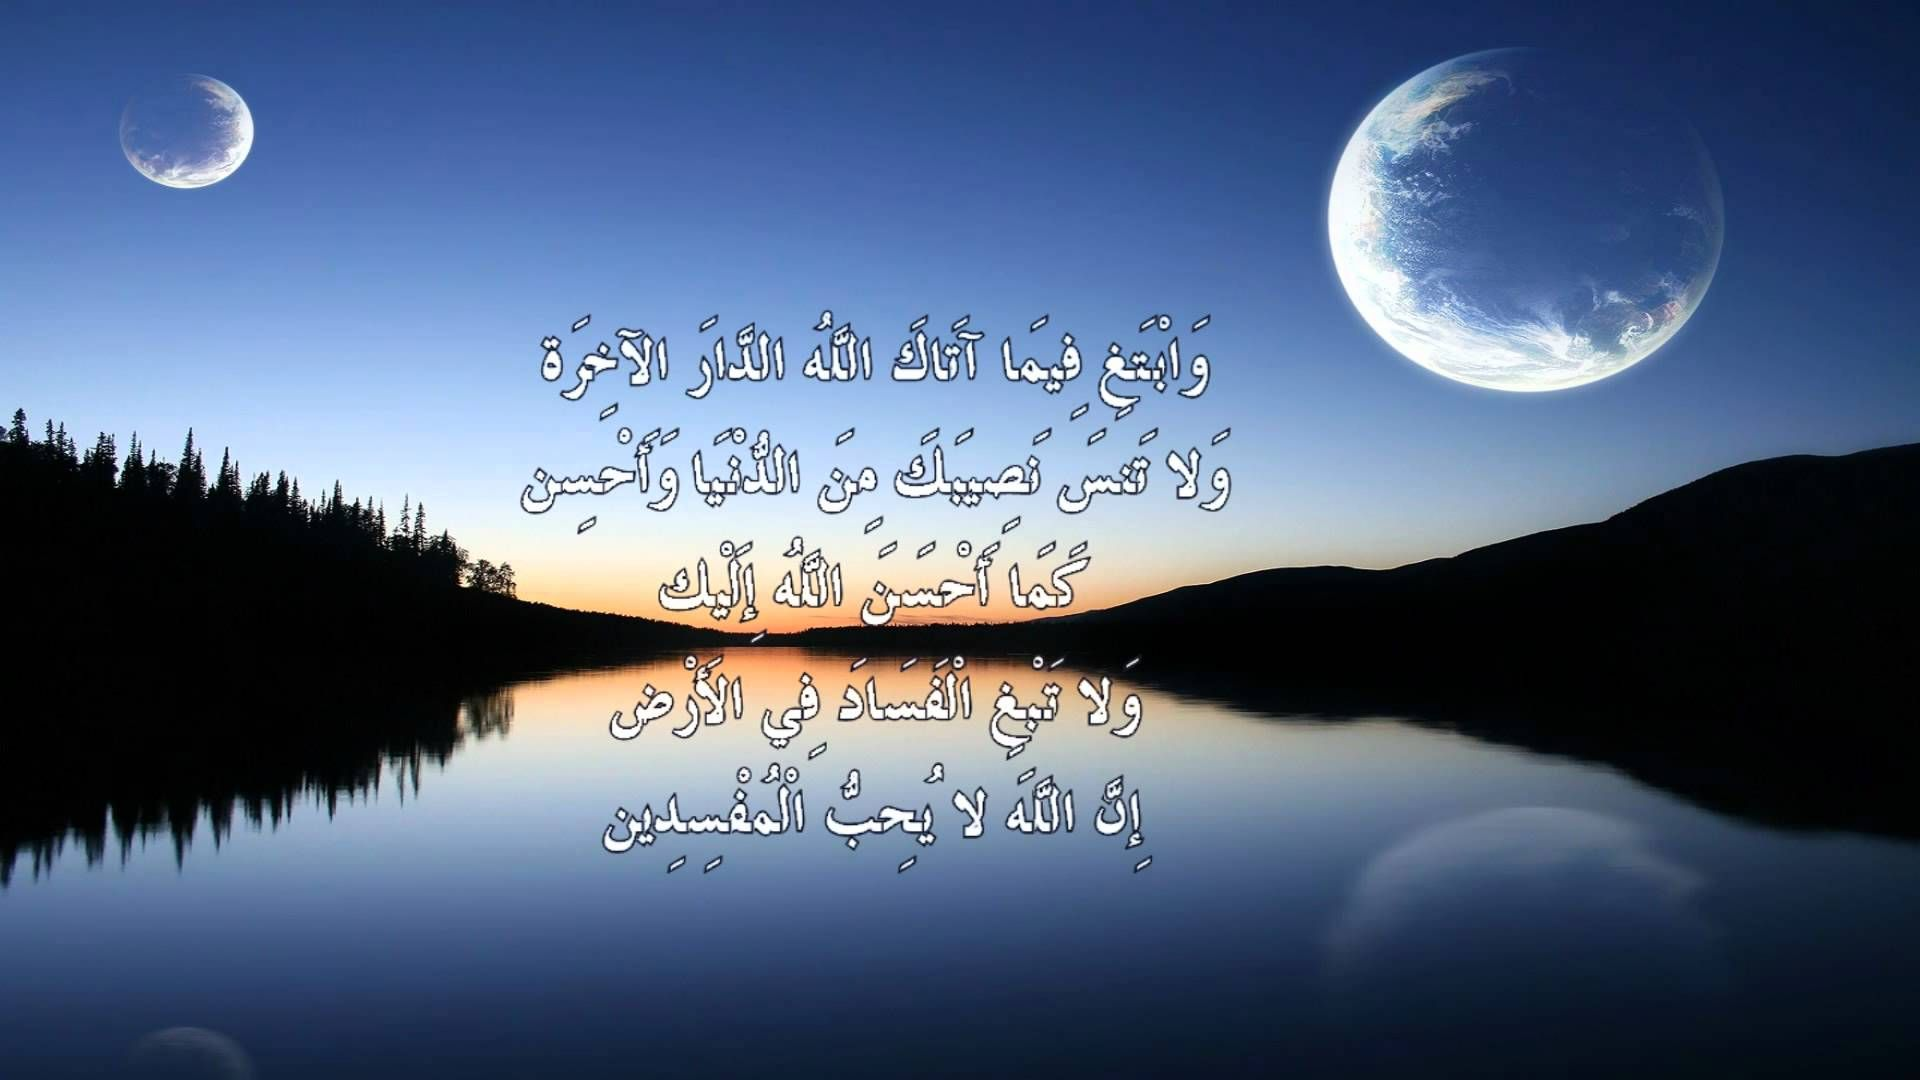 Https Islamic Images Org ولا تنسى نصيبك من الدنيا اعمل لاخرتك ك Http Islamic Images Org Islamic Images Celestial Outdoor